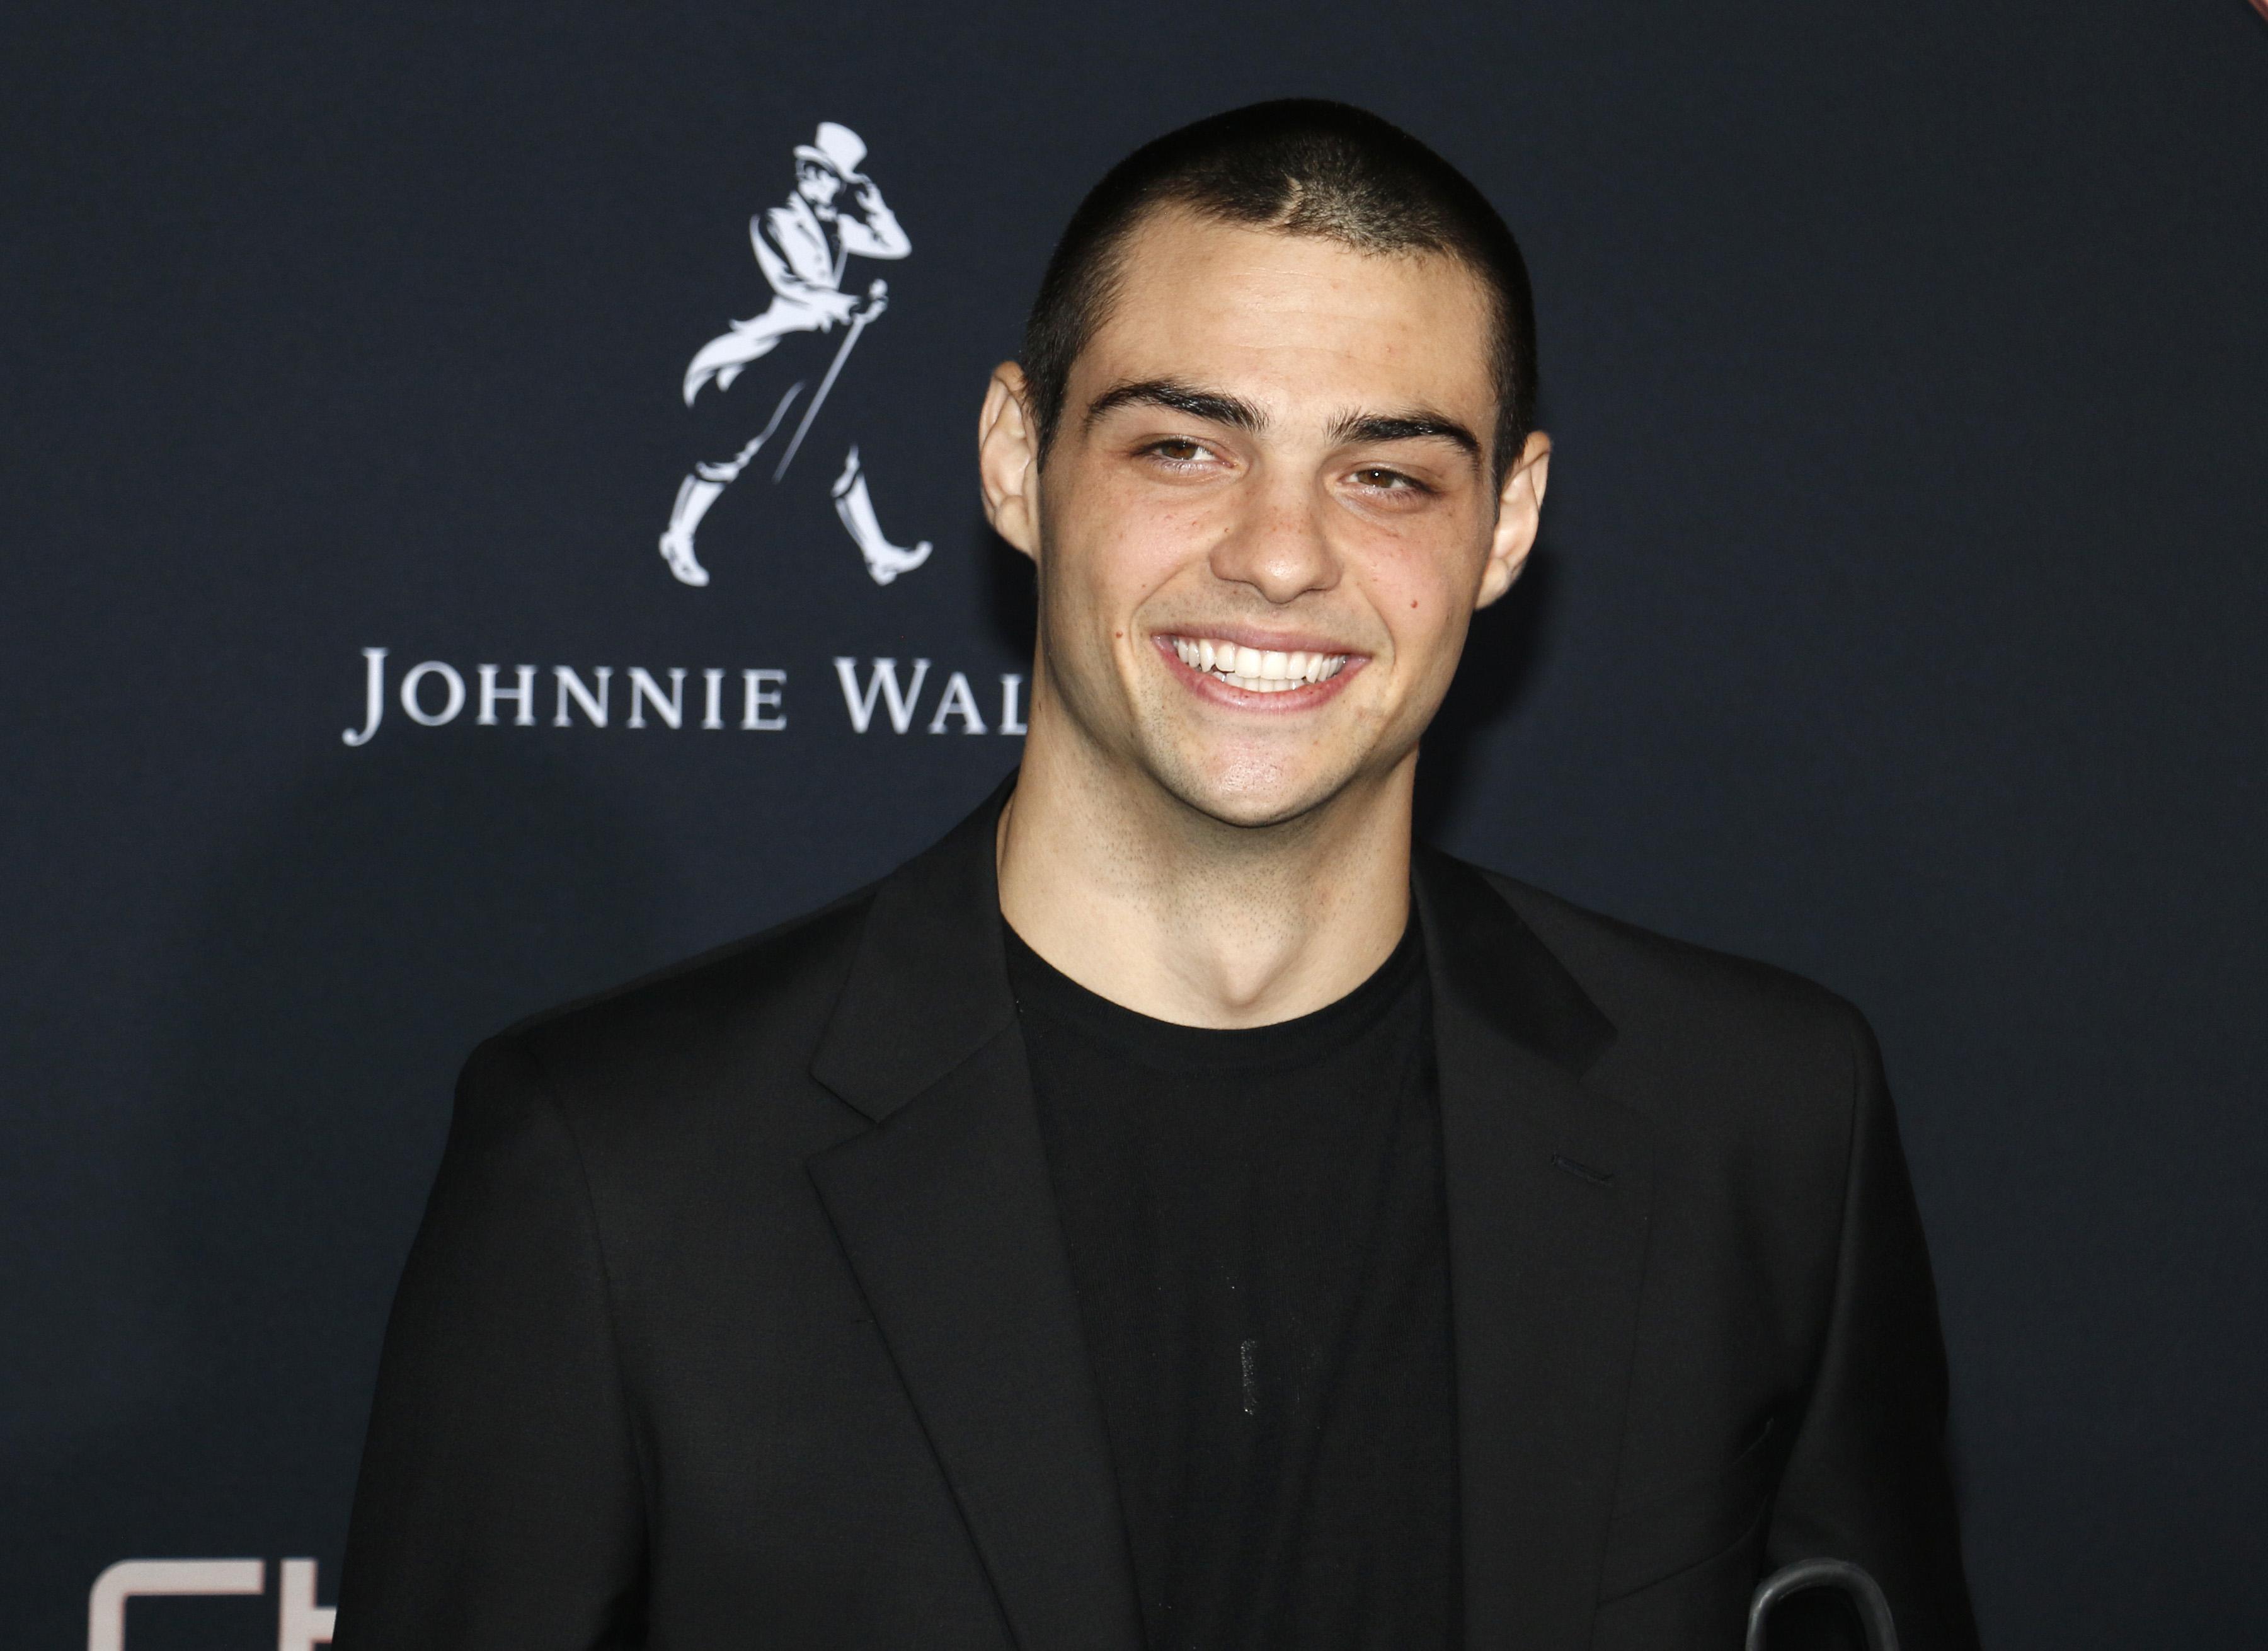 24歲演員Noah Centineo